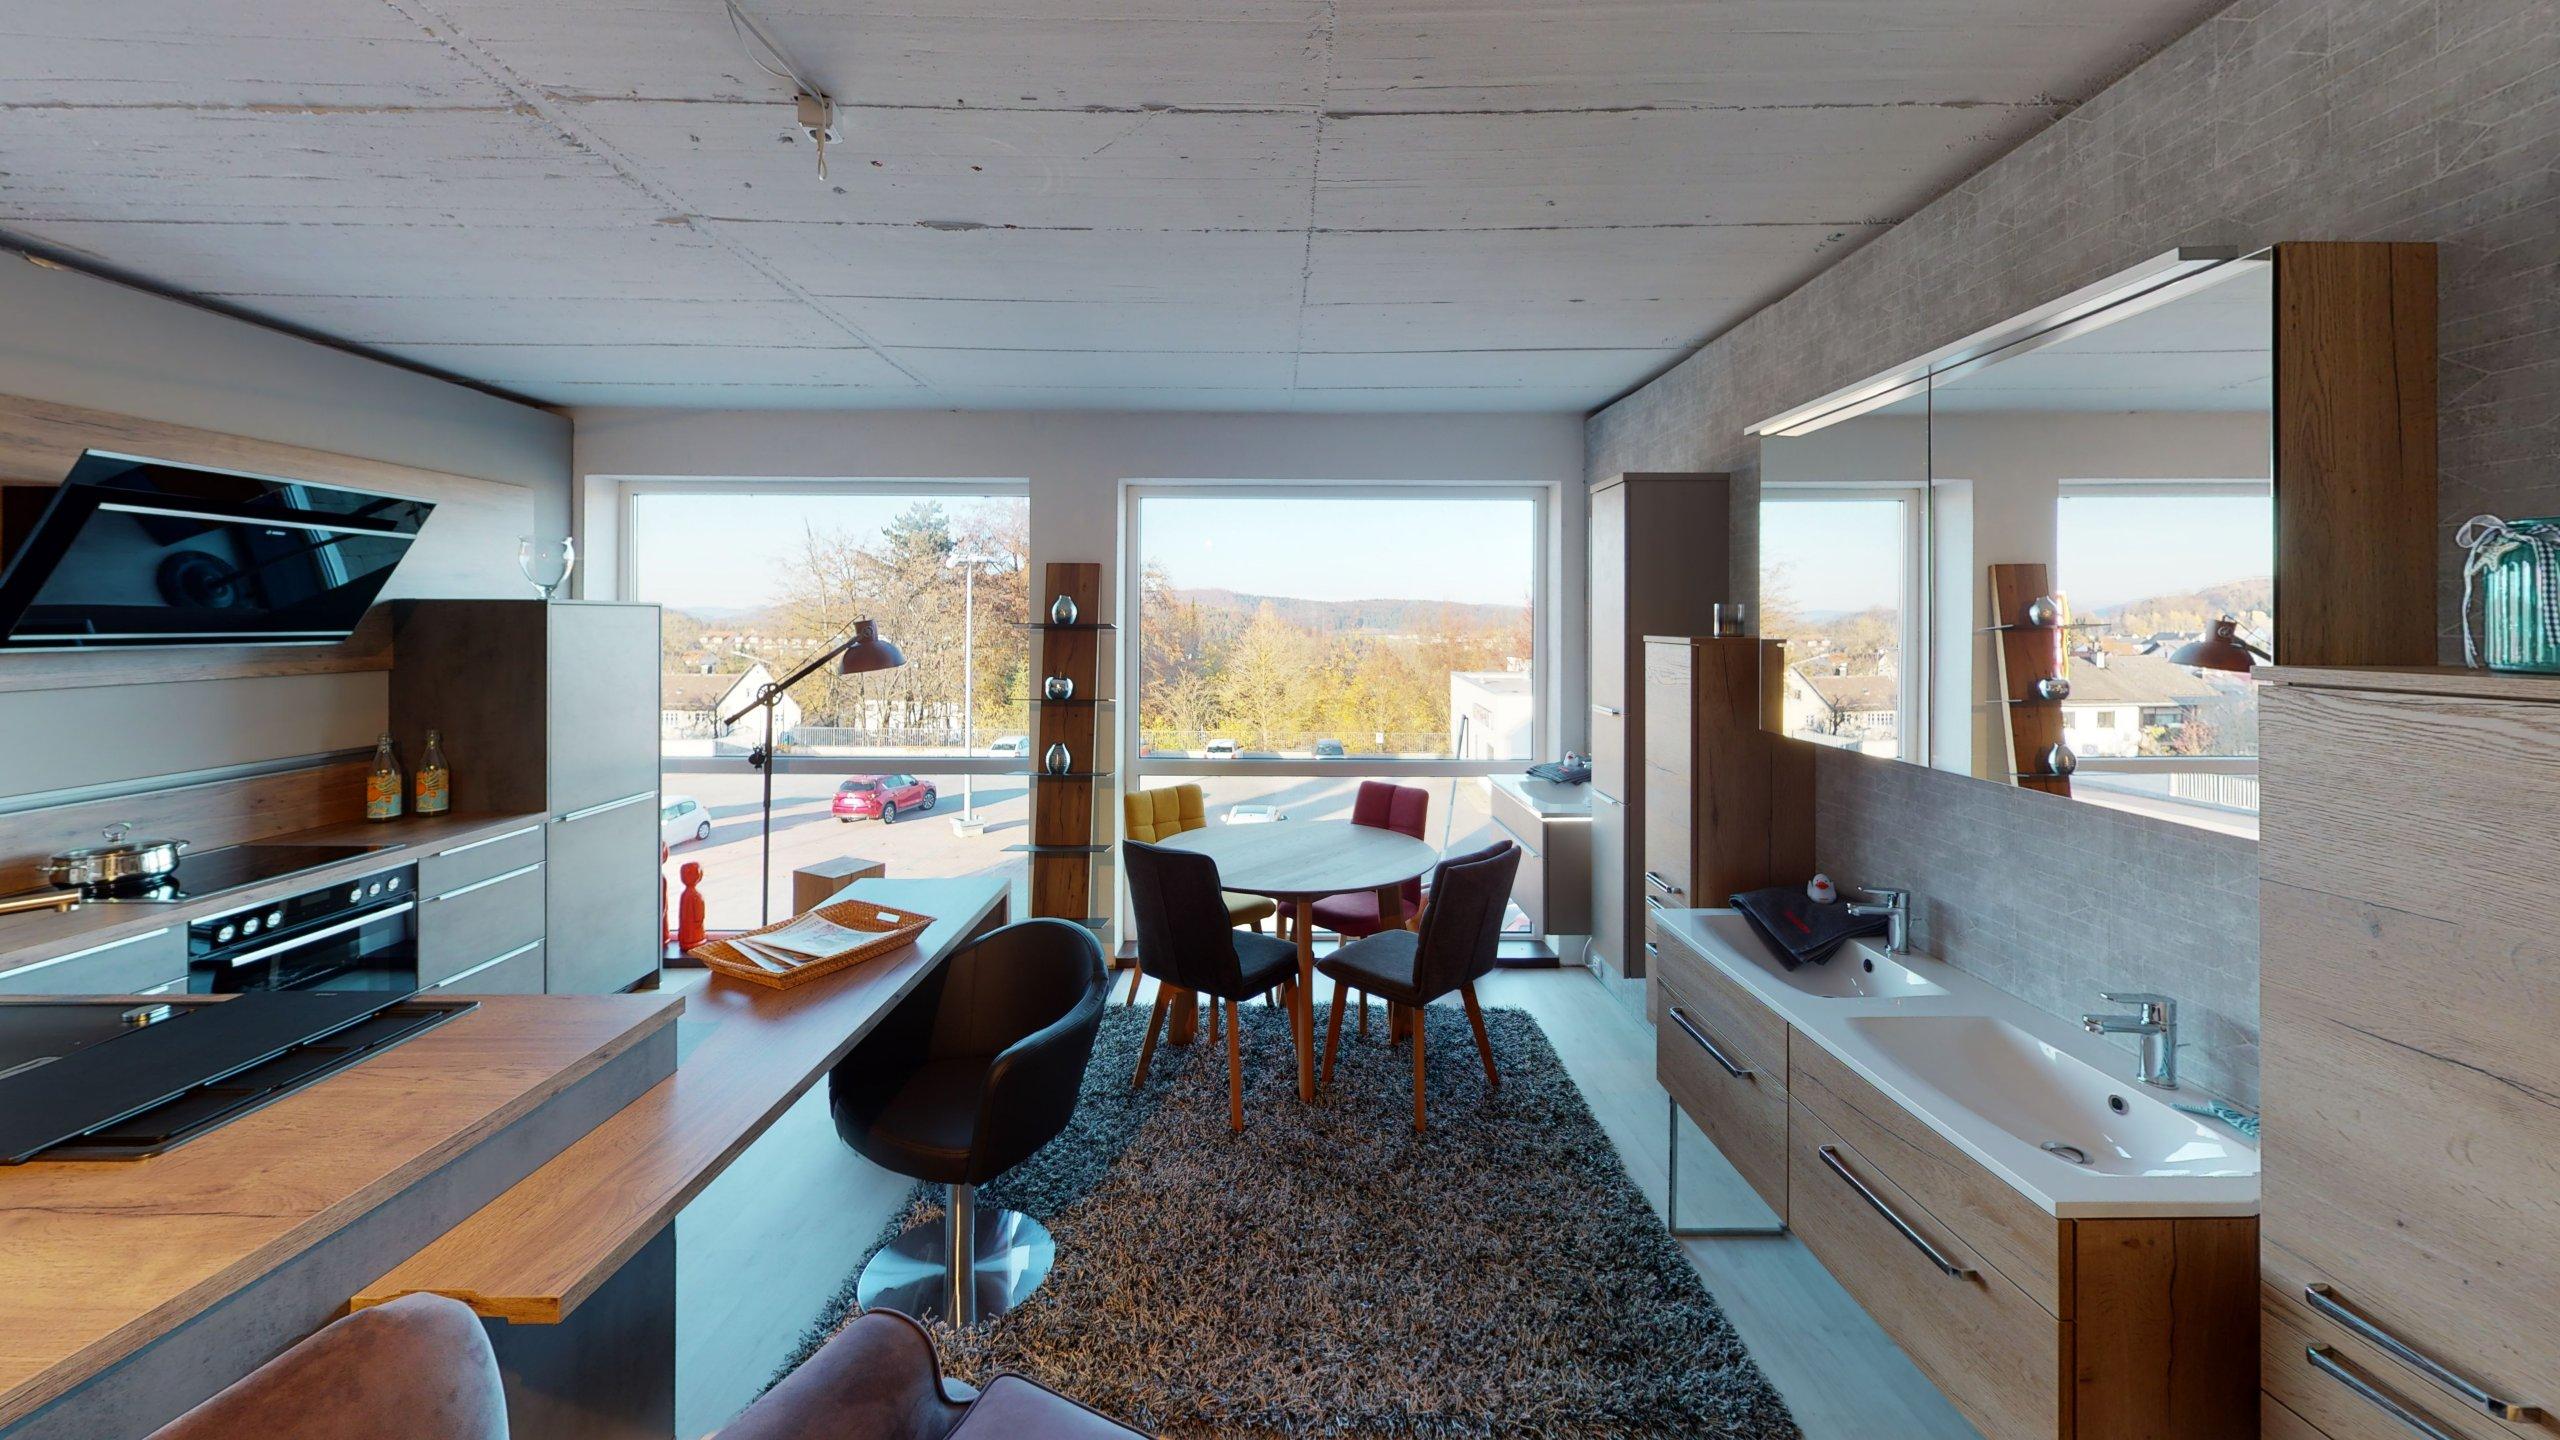 Möbel Dengler Bad und Küchenmöbel